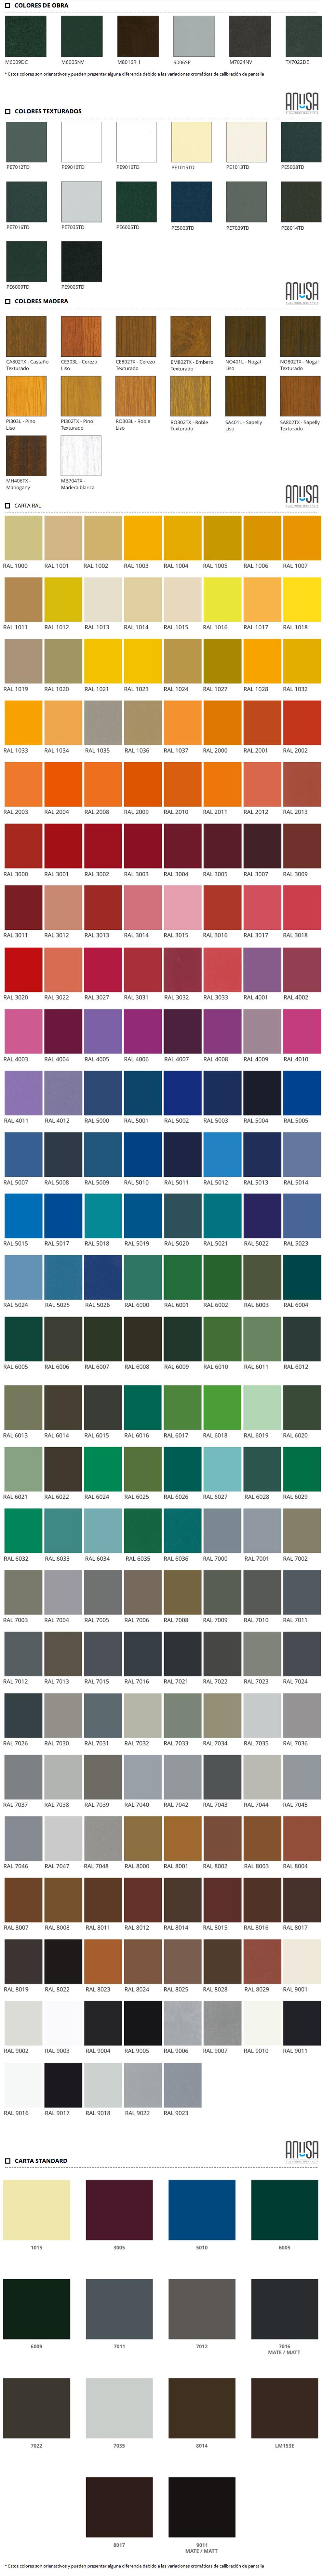 Colores para Carpintería de aluiminio